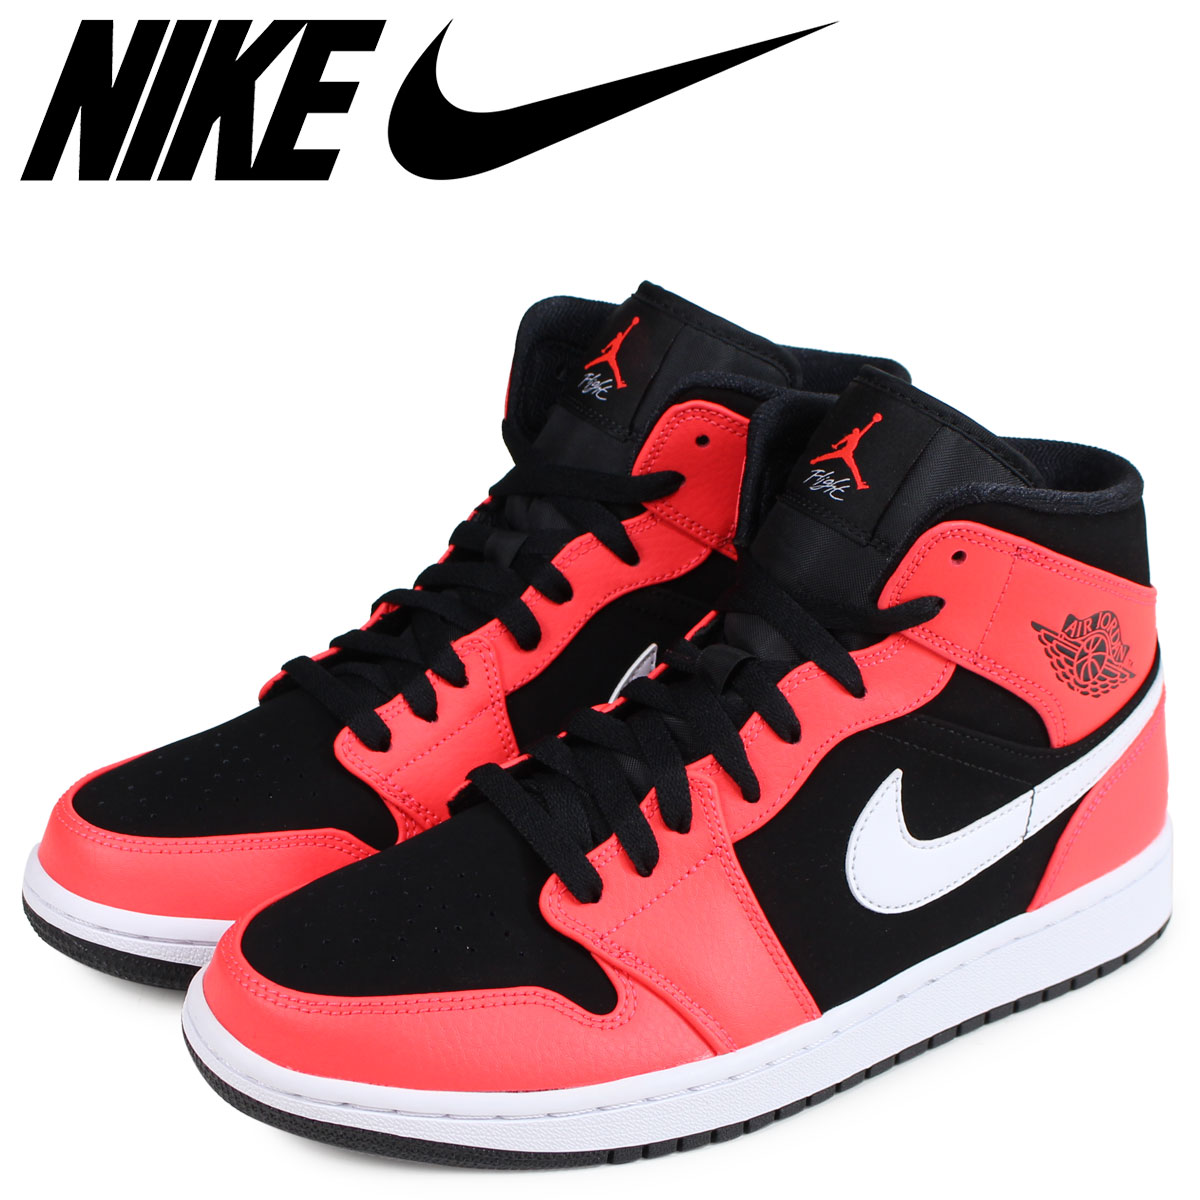 newest collection 68a6e baaf8 NIKE Nike Air Jordan 1 sneakers men AIR JORDAN 1 MID black 554,724-061  1 22  Shinnyu load